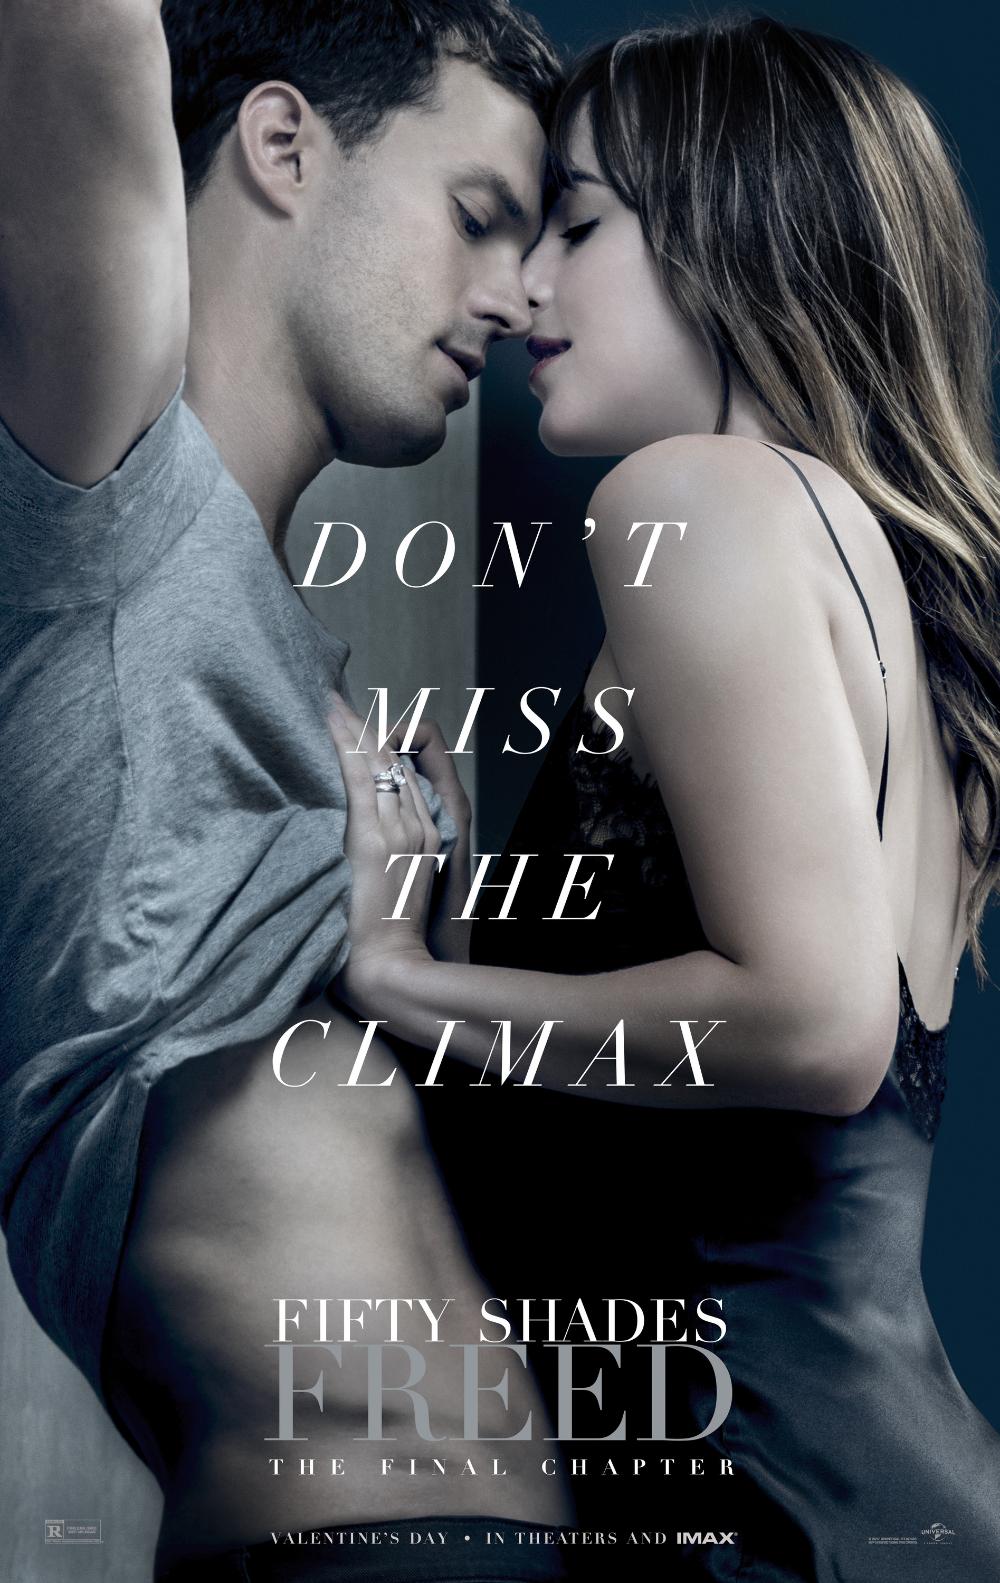 Pin On Fifty Shades Darker Movie